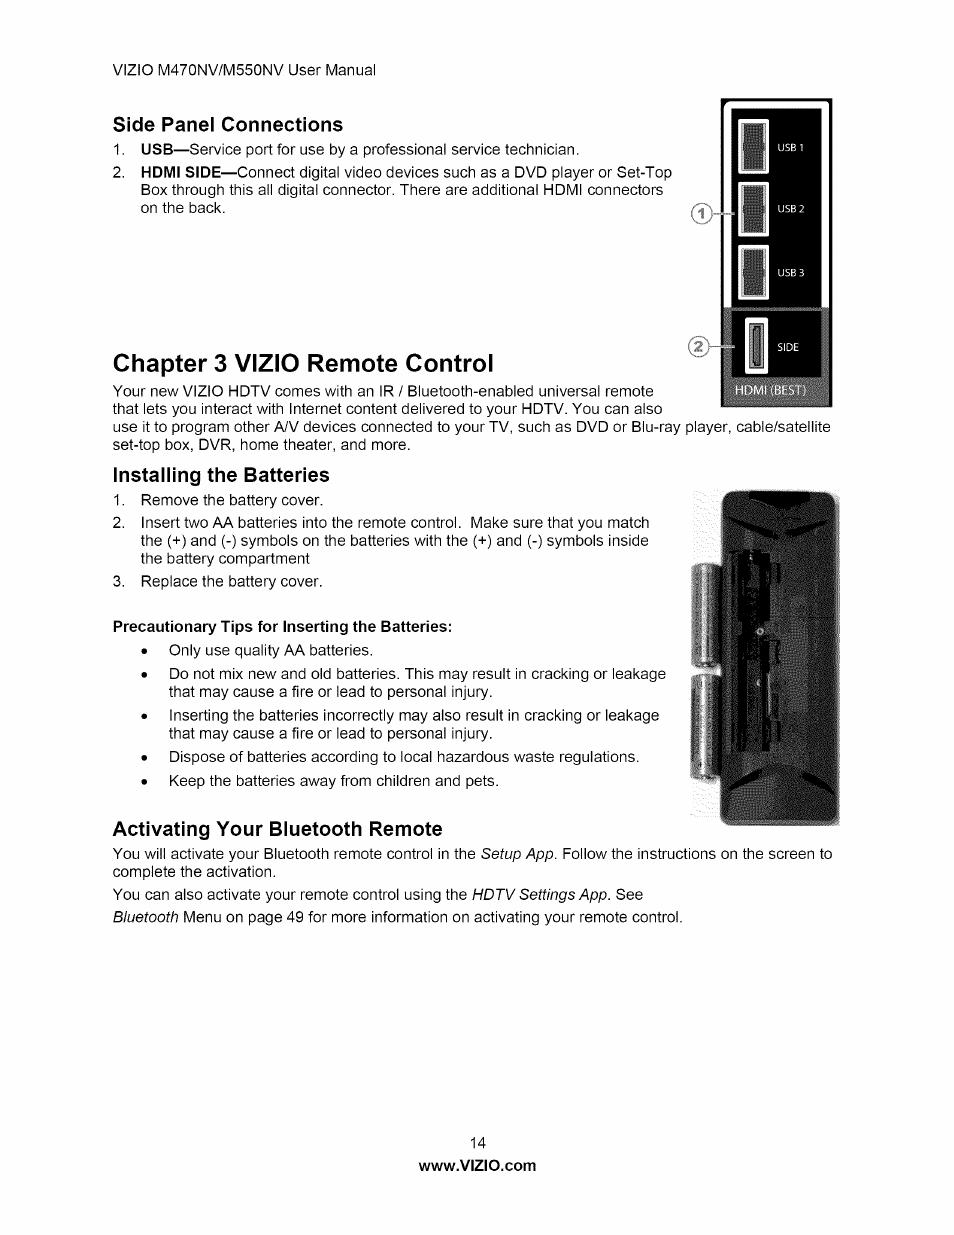 side panel connections chapter 3 vizio remote control installing rh manualsdir com vizio m470nv service manual Power Supply Board Vizio M470NV